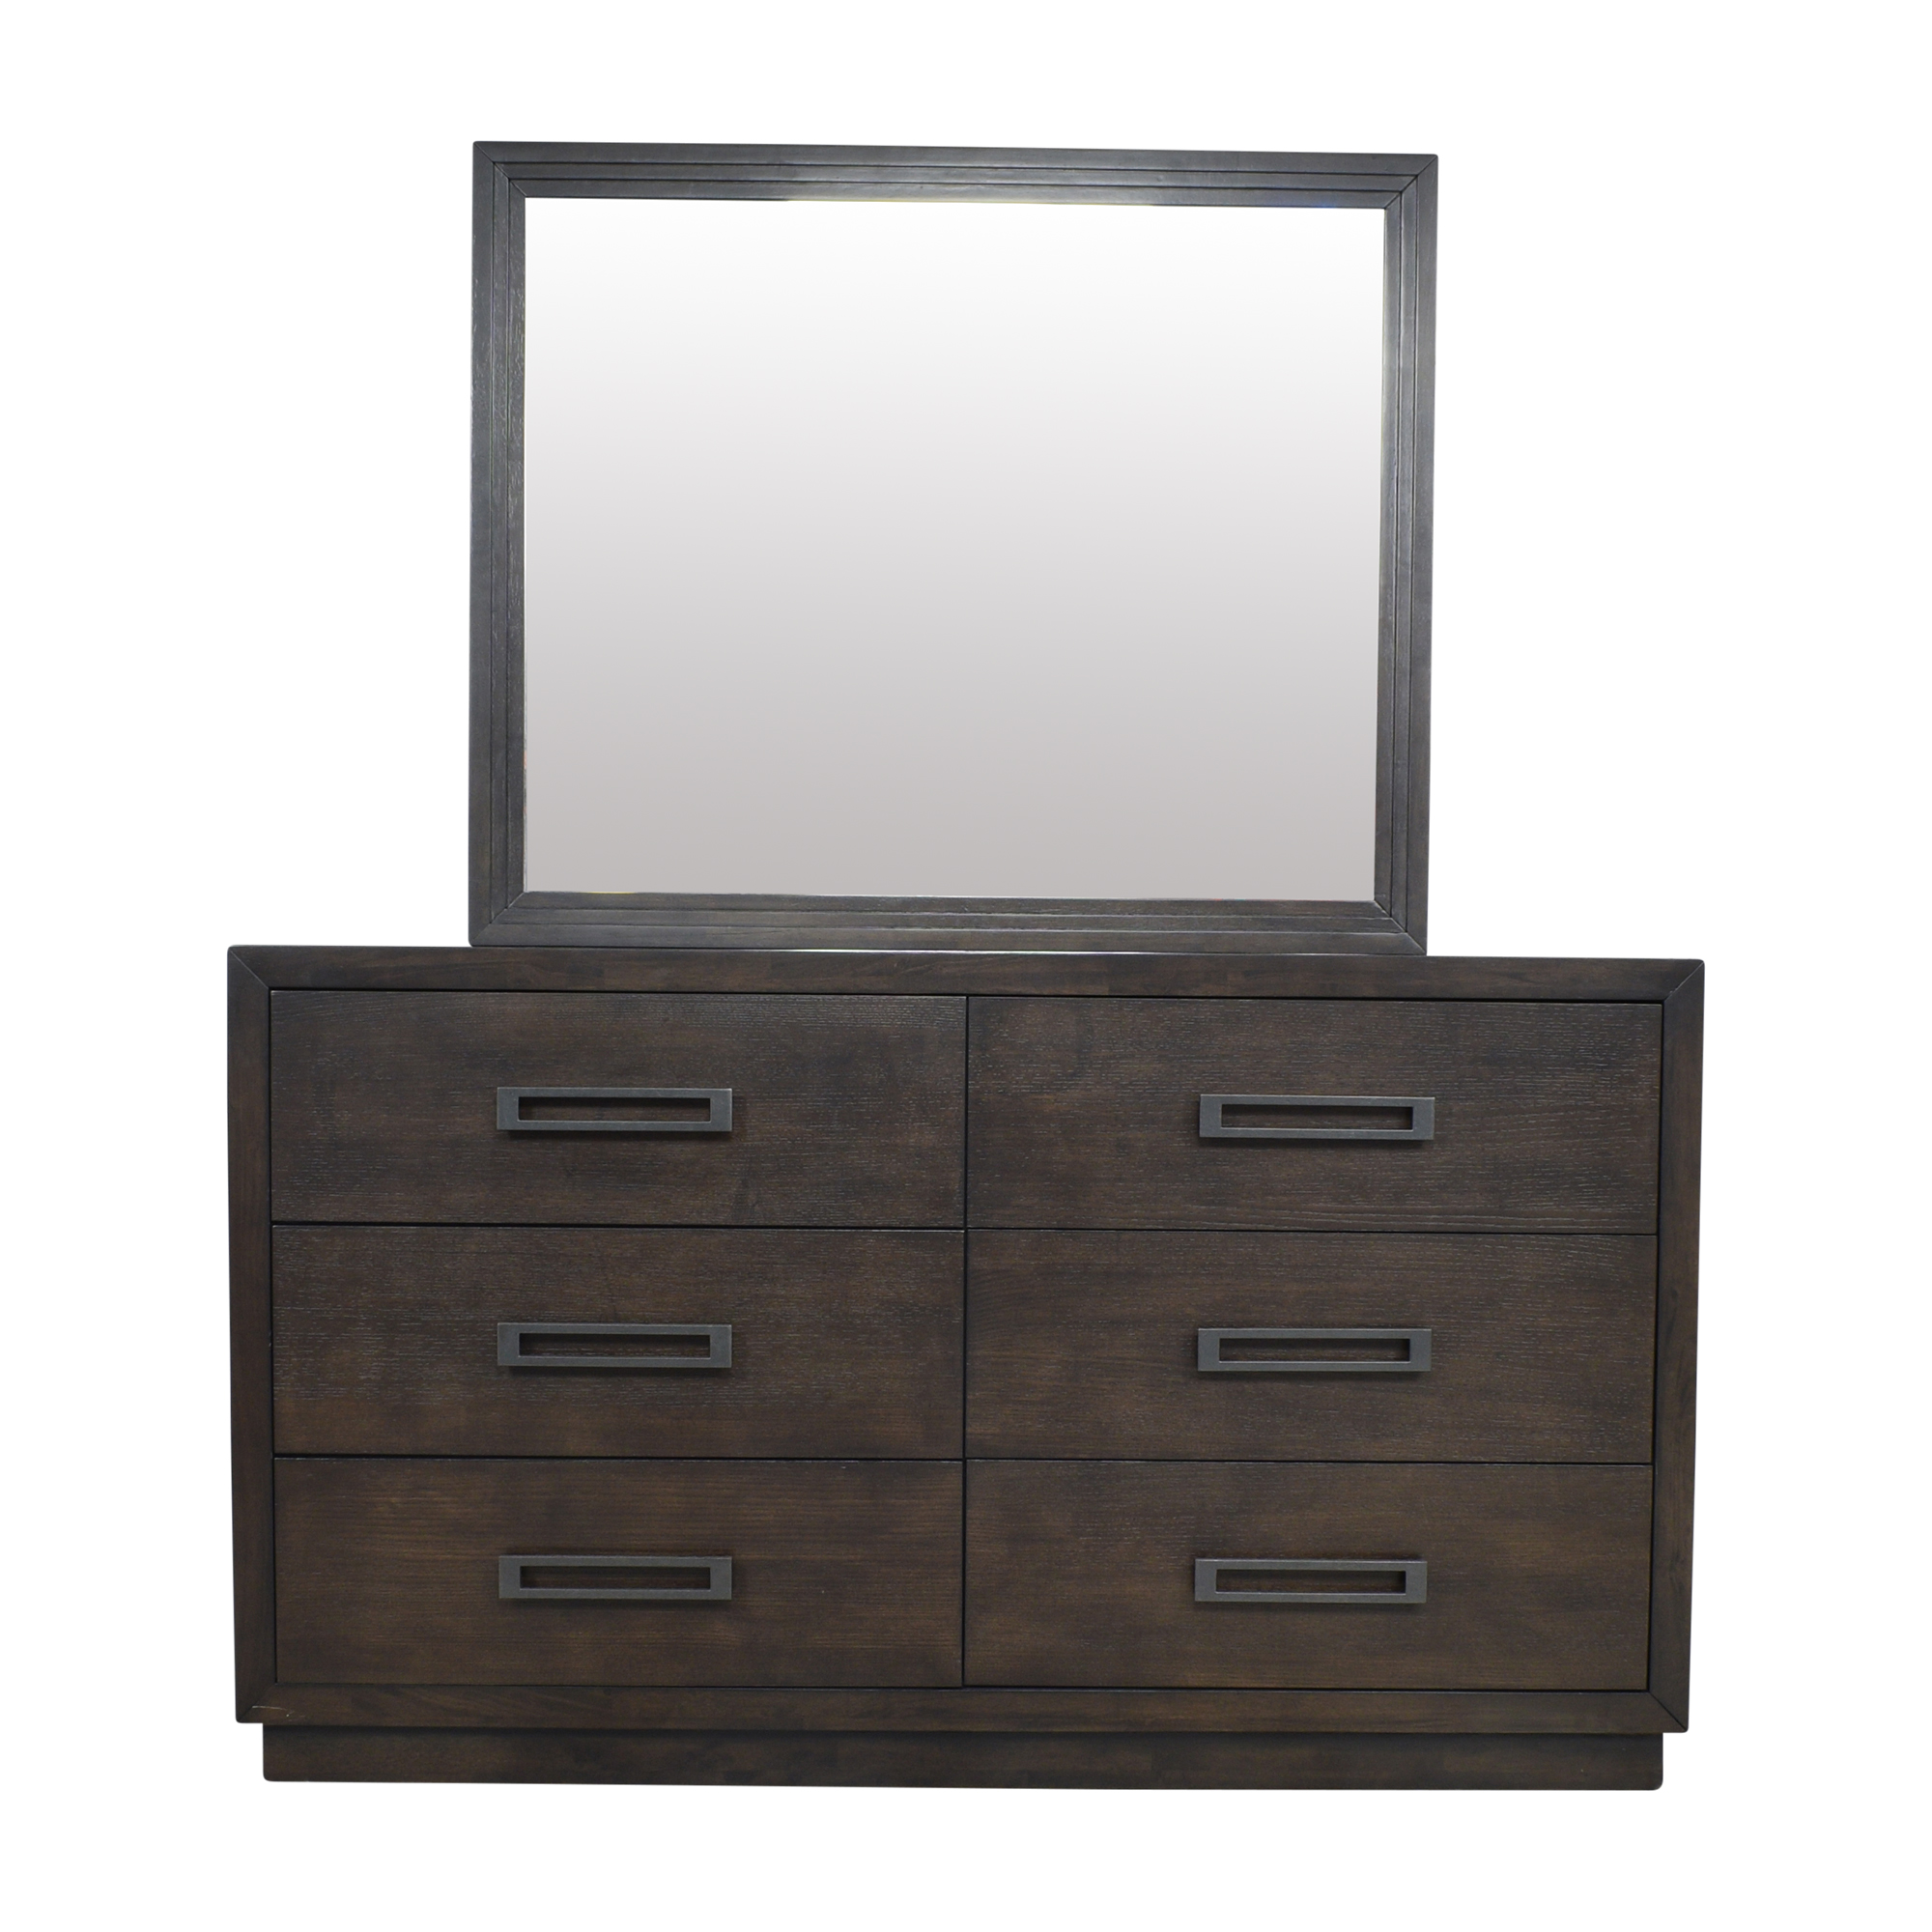 shop Raymour & Flanigan Double Dresser with Mirror Raymour & Flanigan Storage